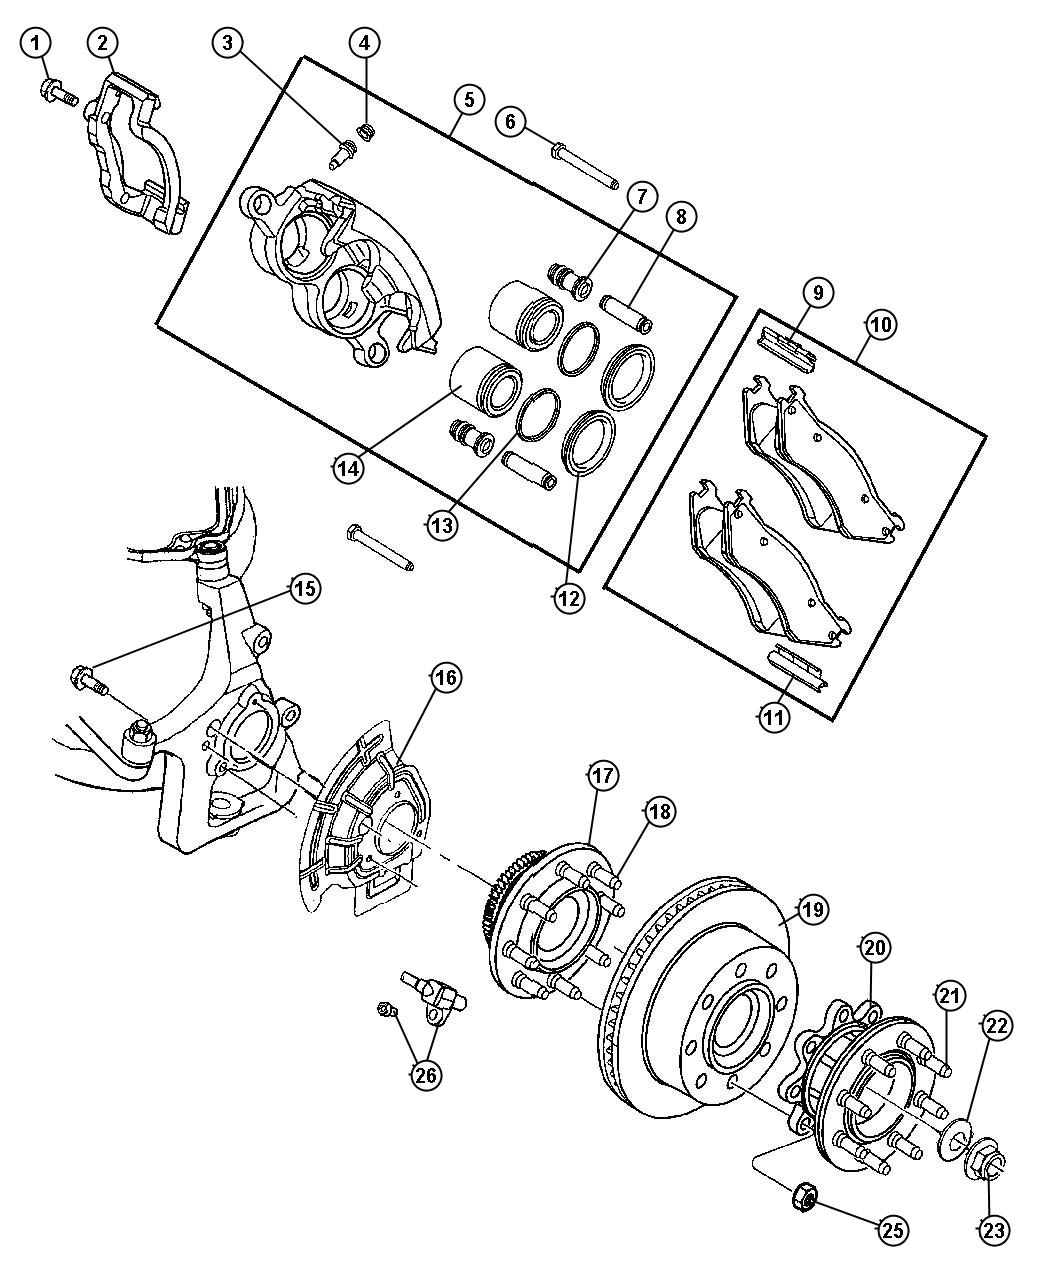 Oem Dodge Ram 3500 Brakes Parts Online Factory Chrysler